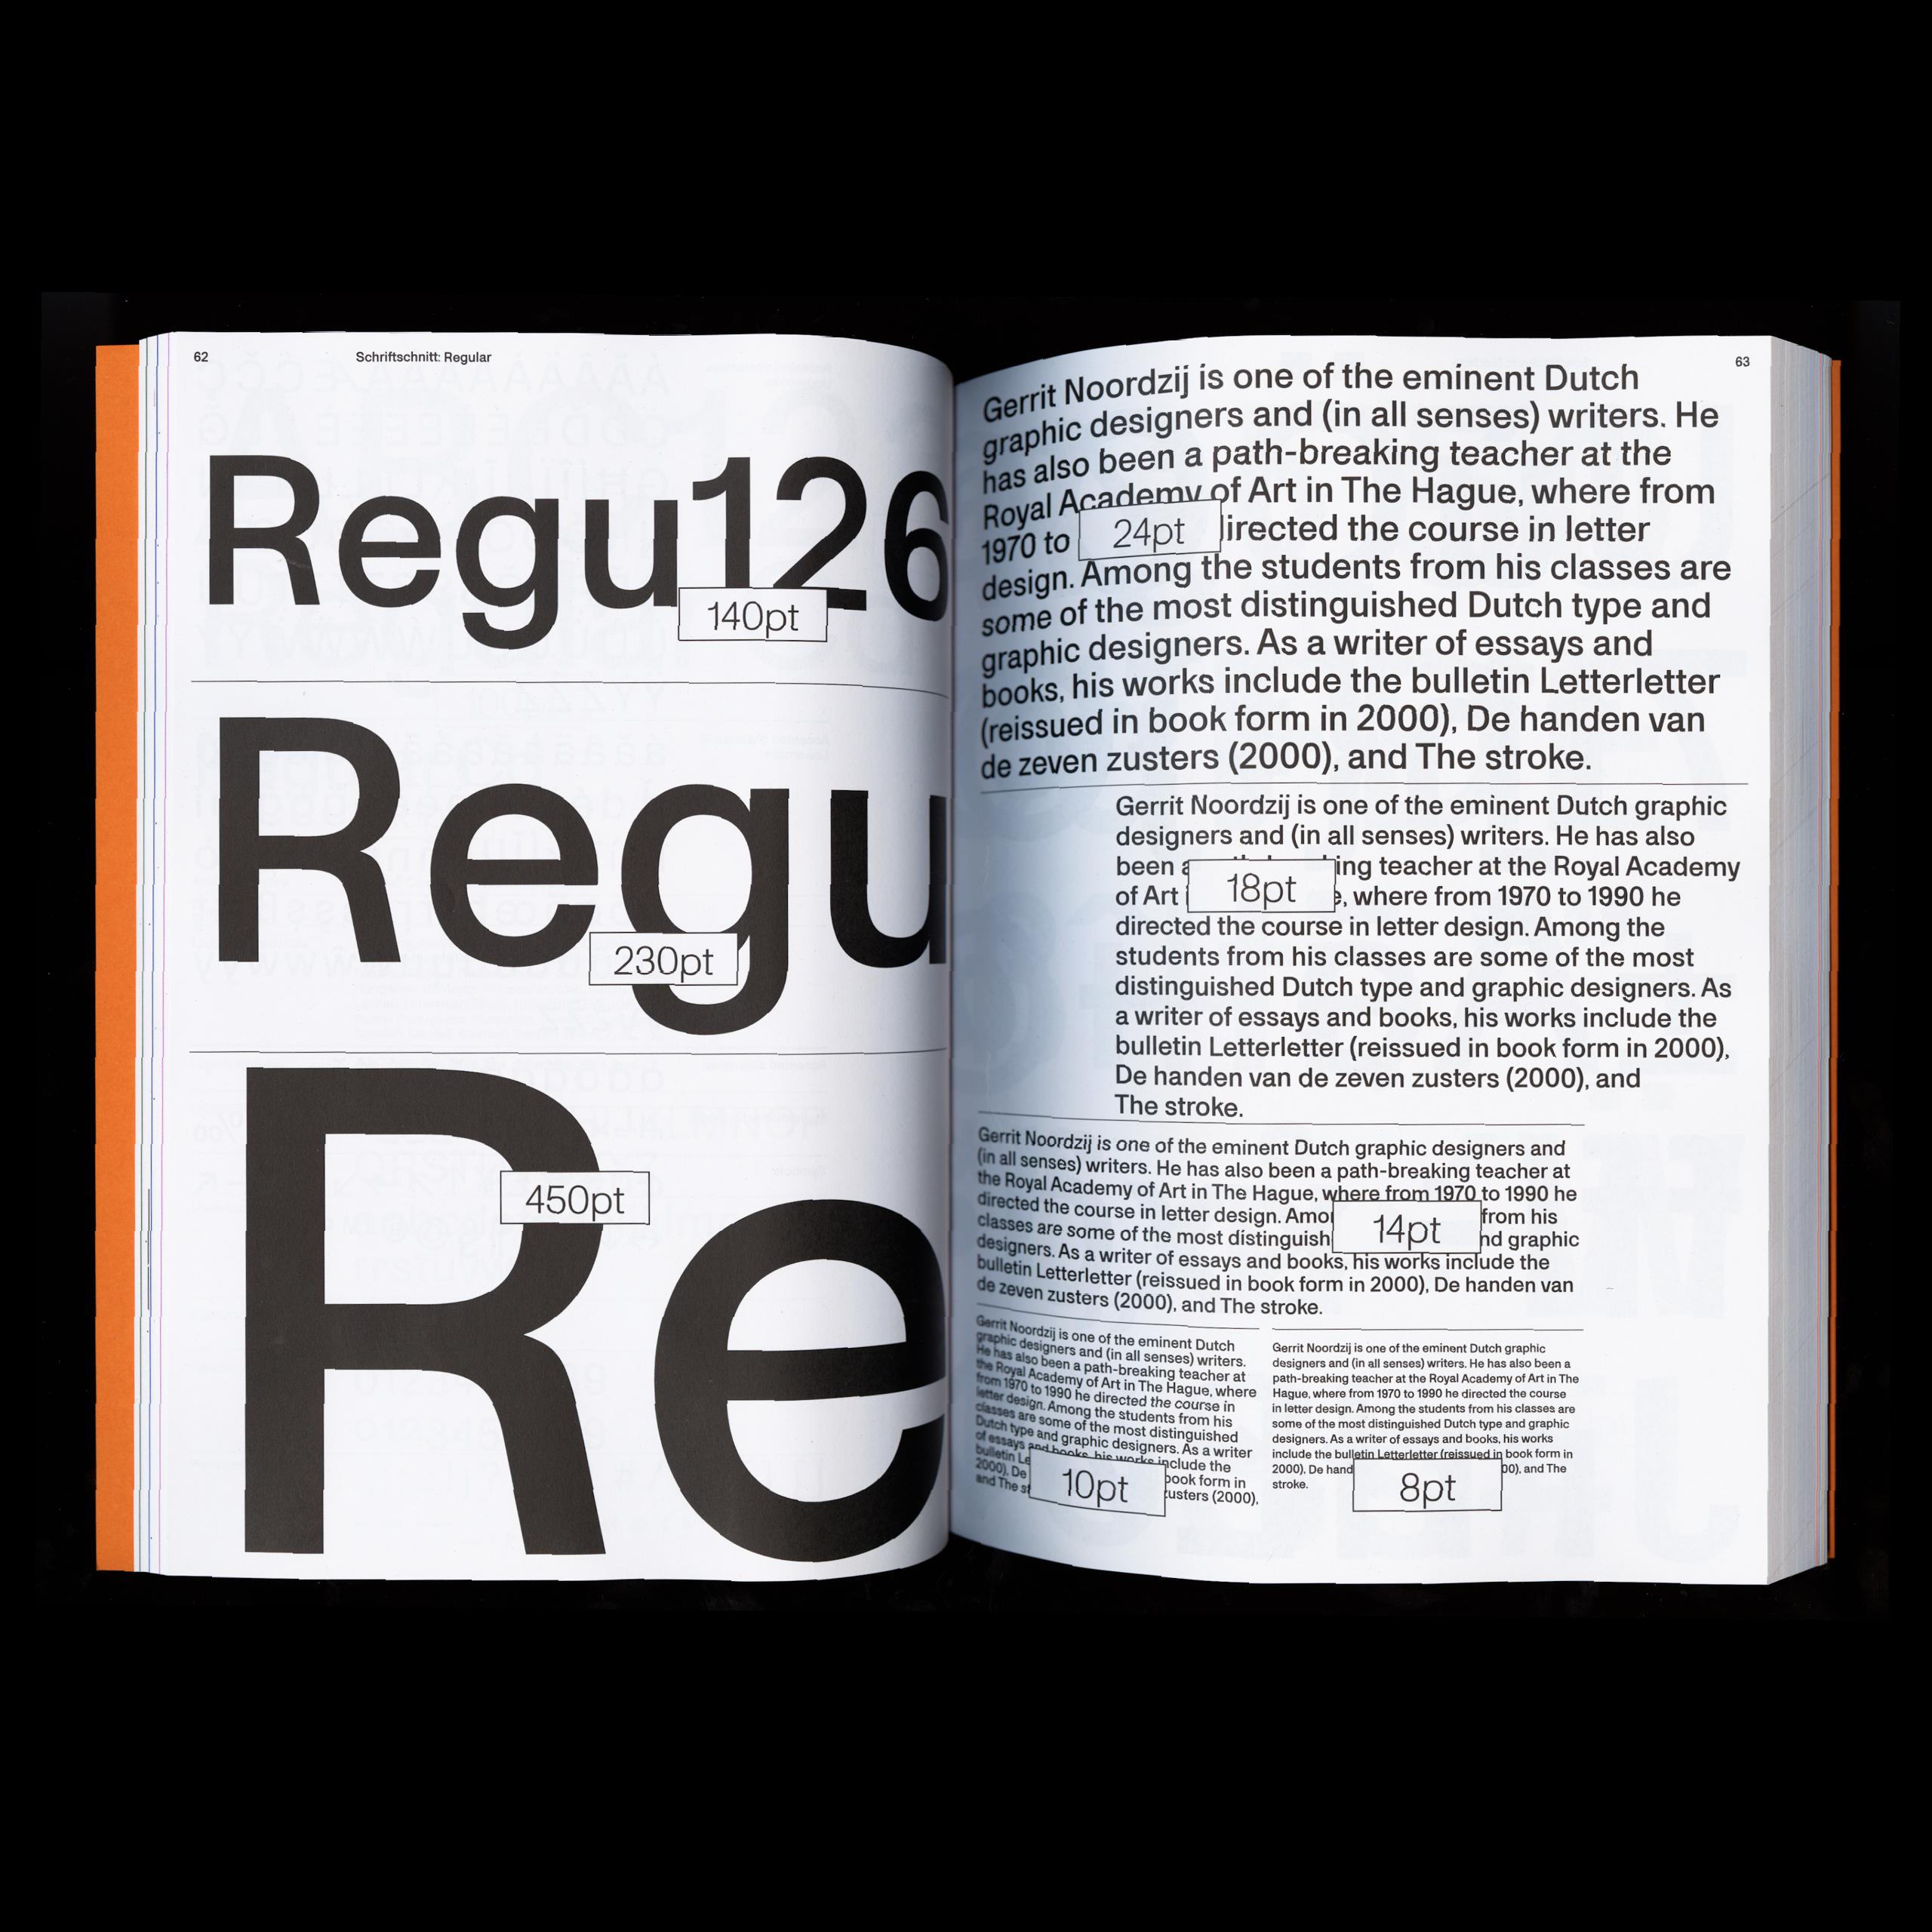 Daniel_Stuhlpfarrer_Spekulative-Schriftgestaltung-Speculative-Type-Design_WEB75